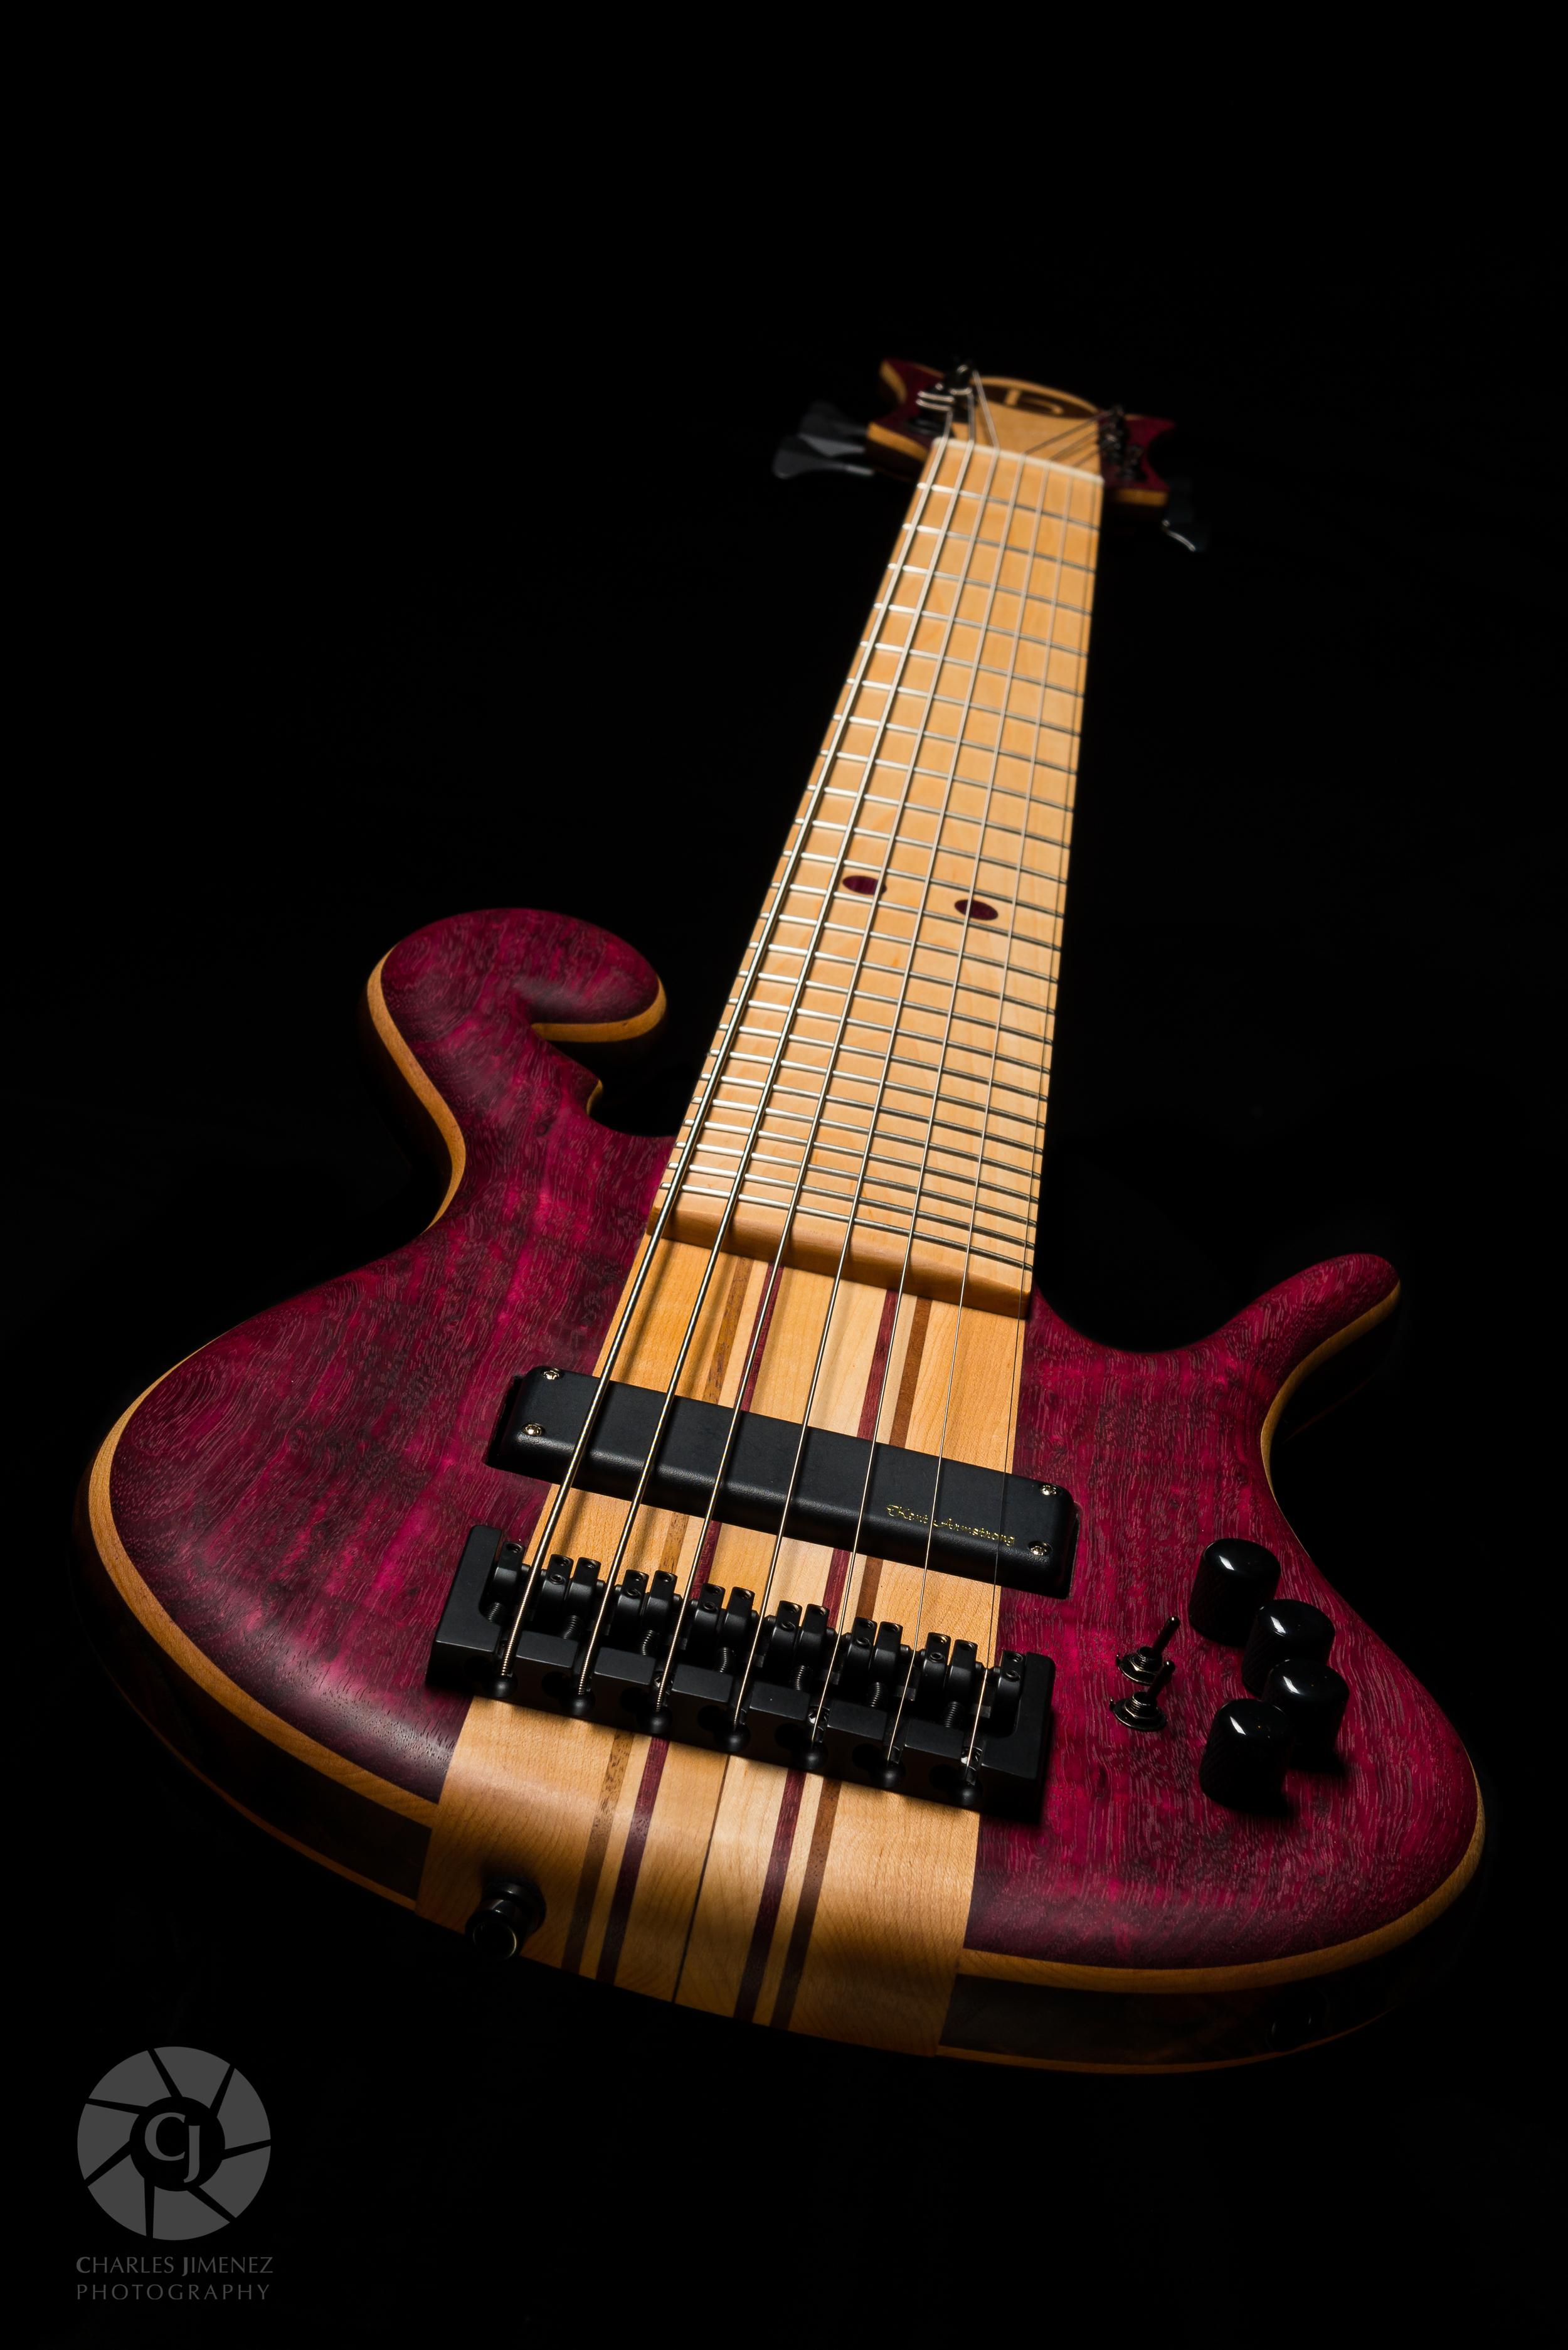 BMT Guitars_Grimace_January 04 2014_01.jpg